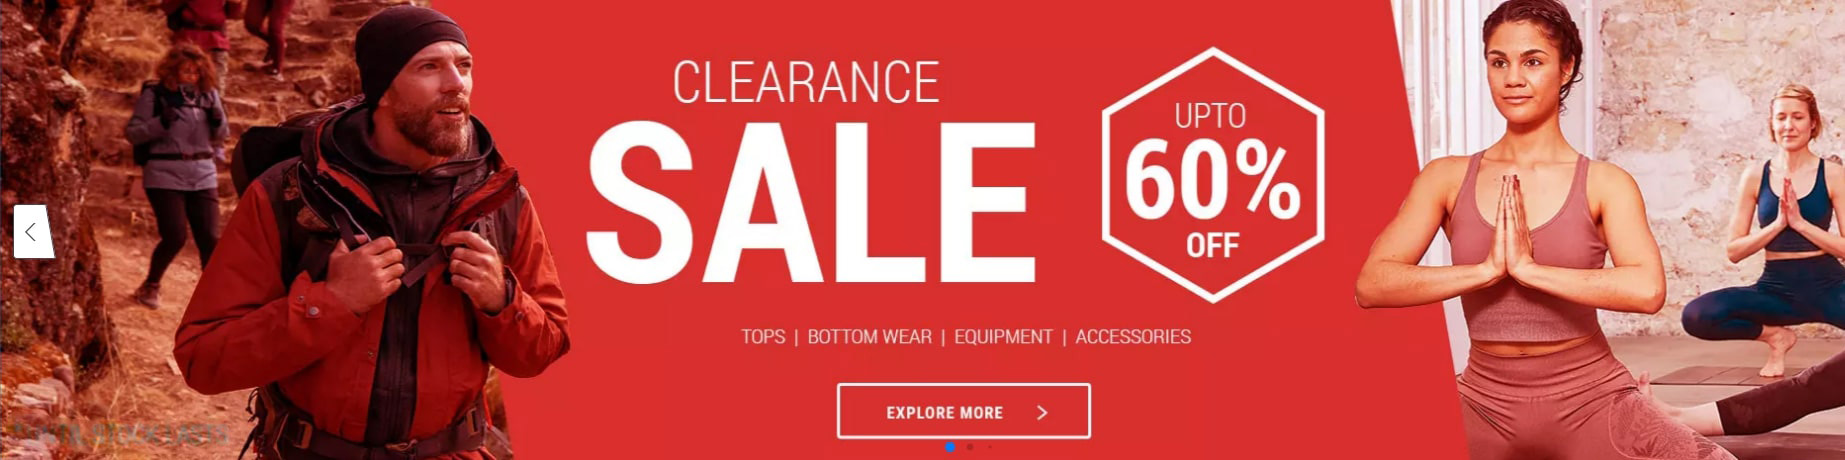 Decathlon Clearance Sale Offers